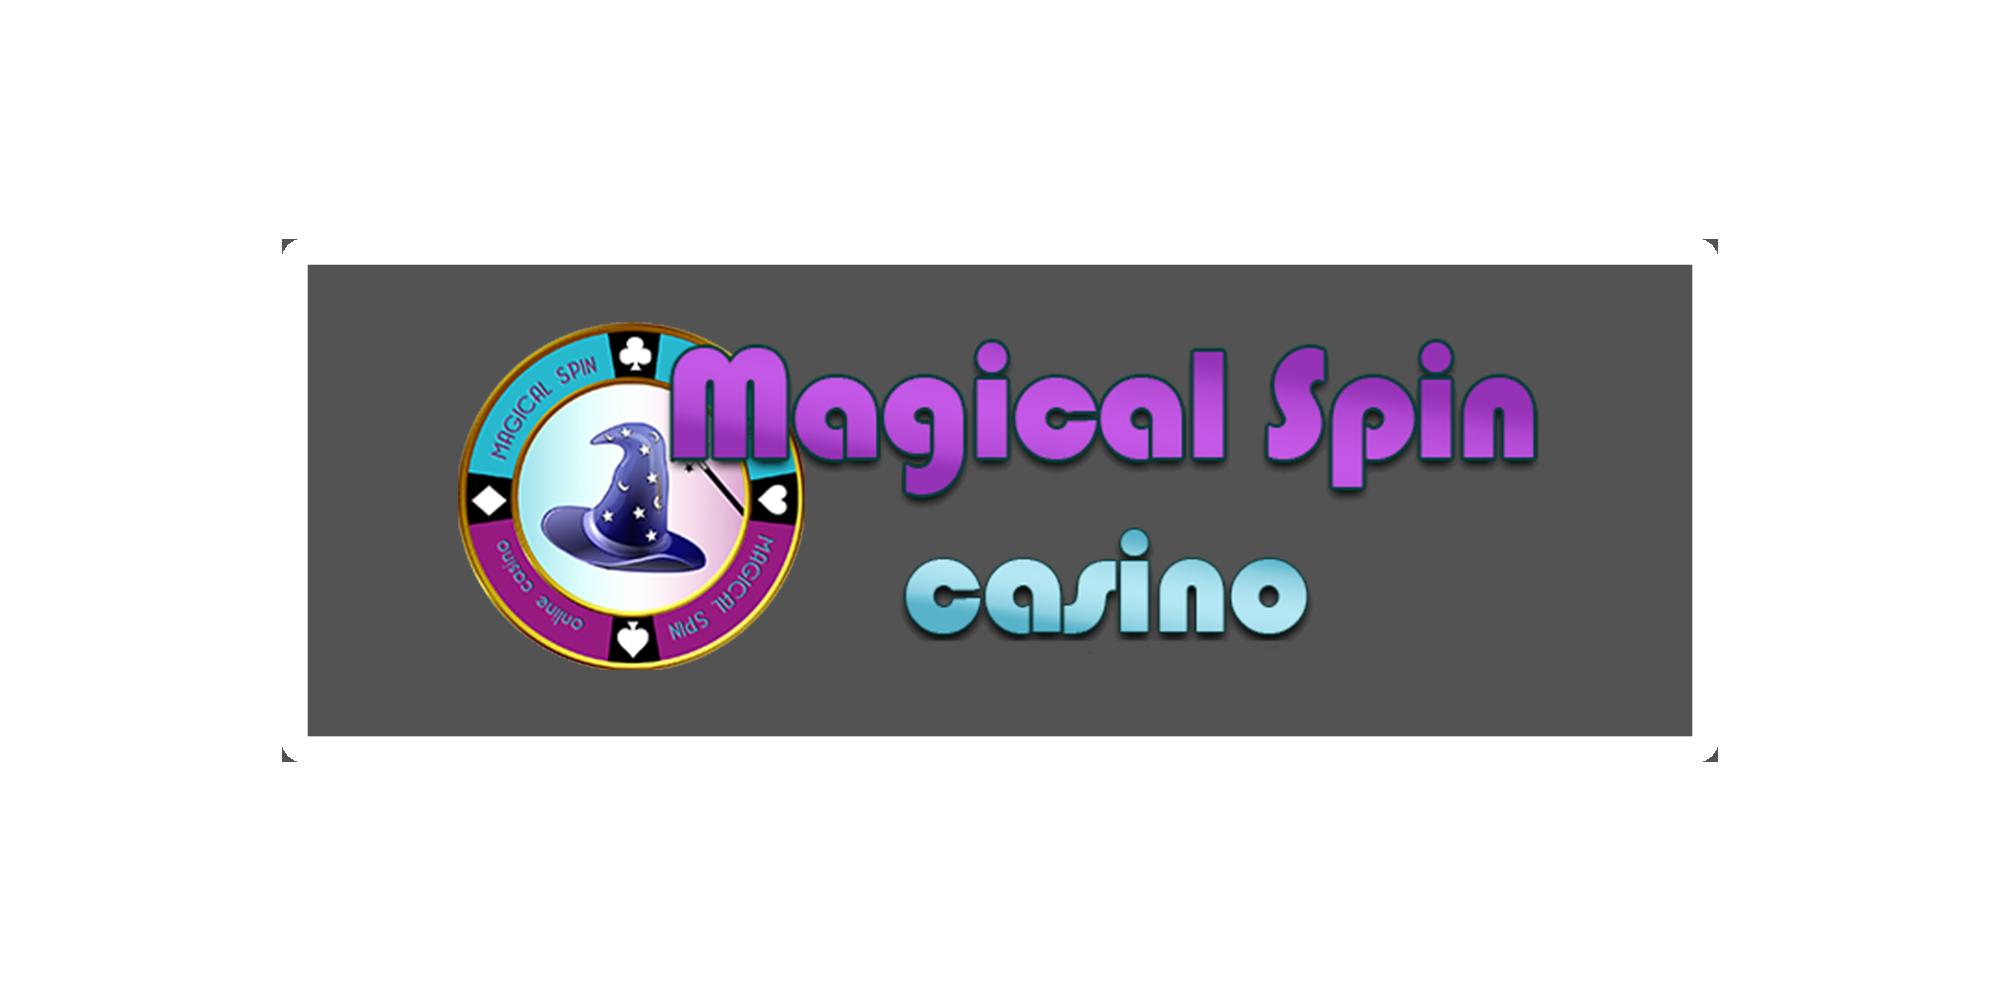 meilleur casino en ligne - Magical spin